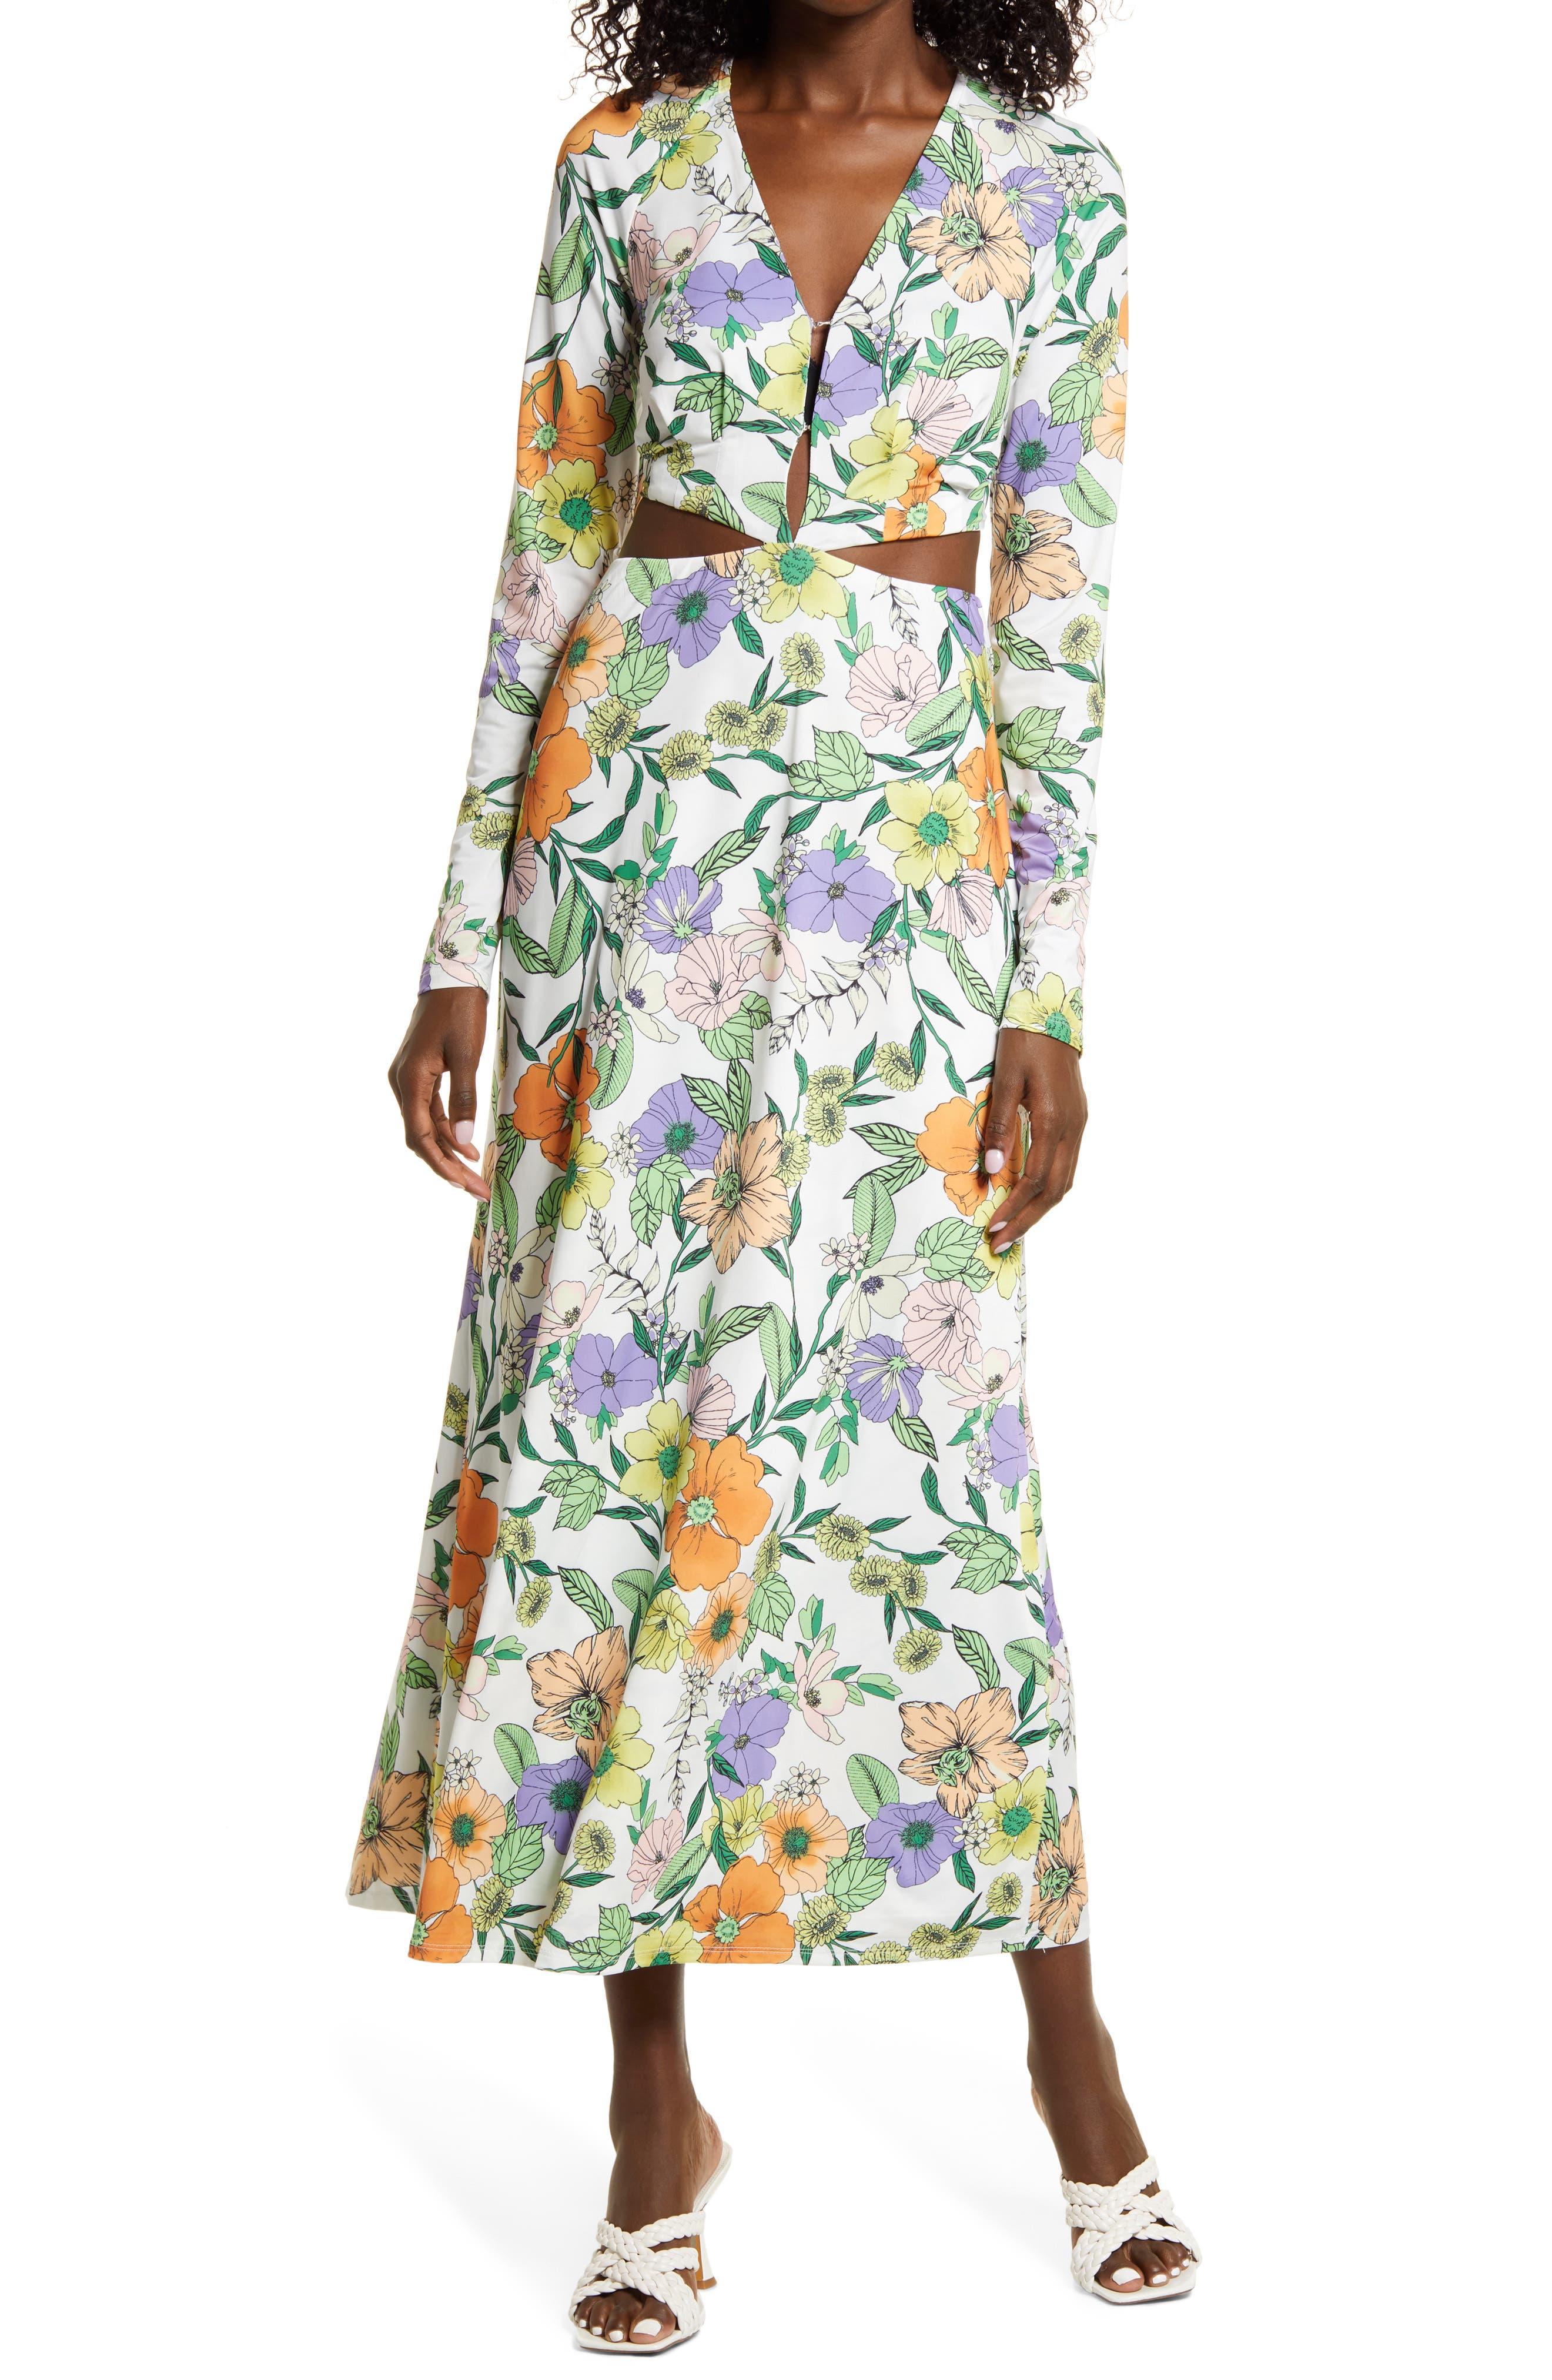 Assi Floral Cutout Detail Long Sleeve Knit Dress